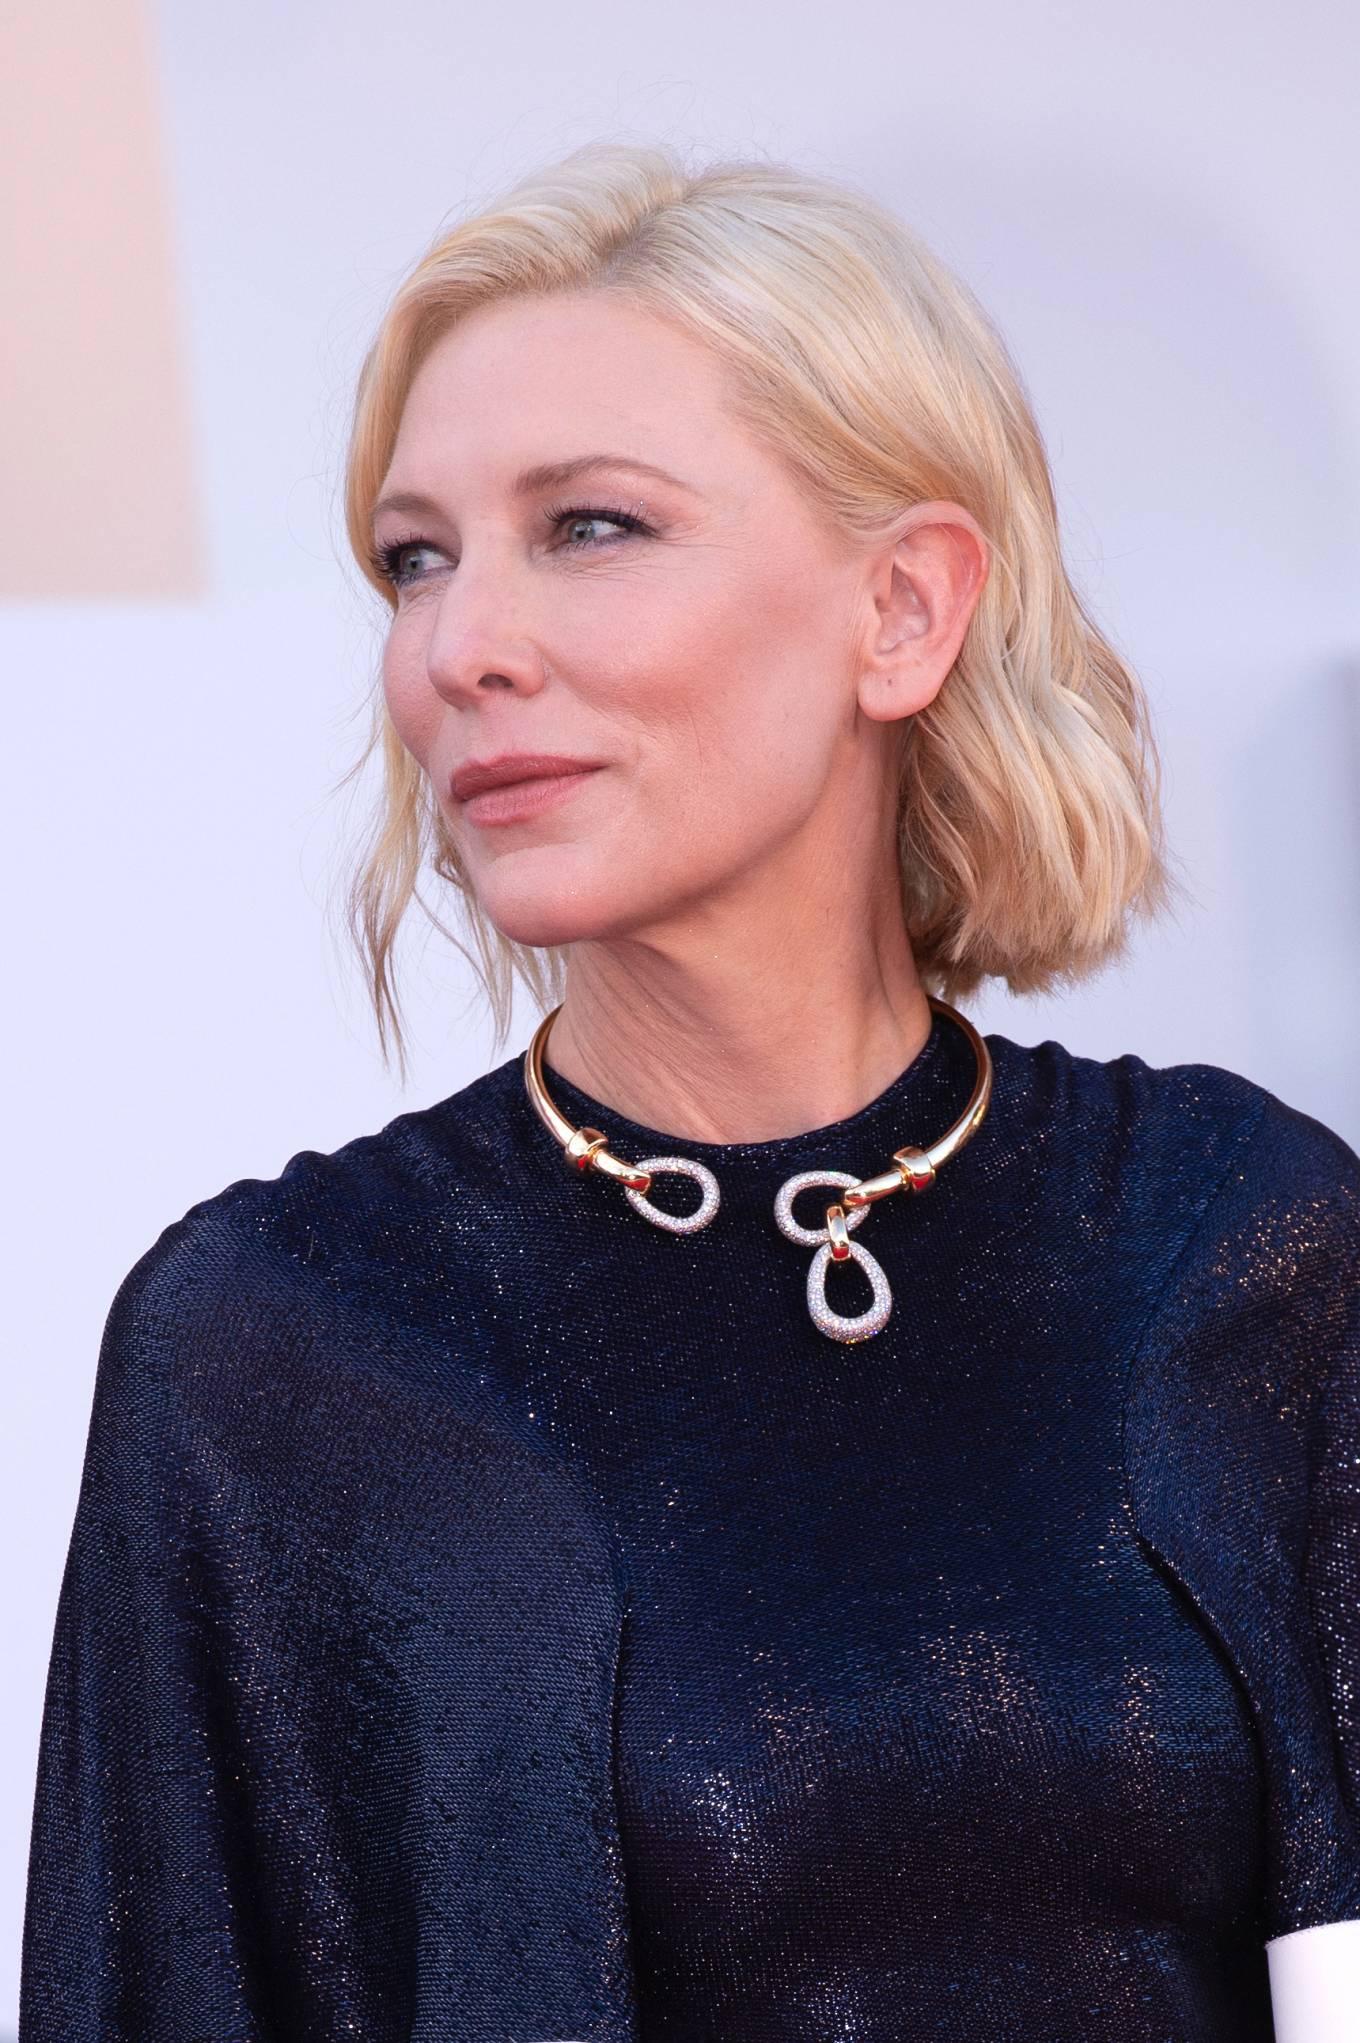 Cate Blanchett 2020 : Cate Blanchett attending Opening Ceremony at 2020 Venice International Film Festival – Italy-09